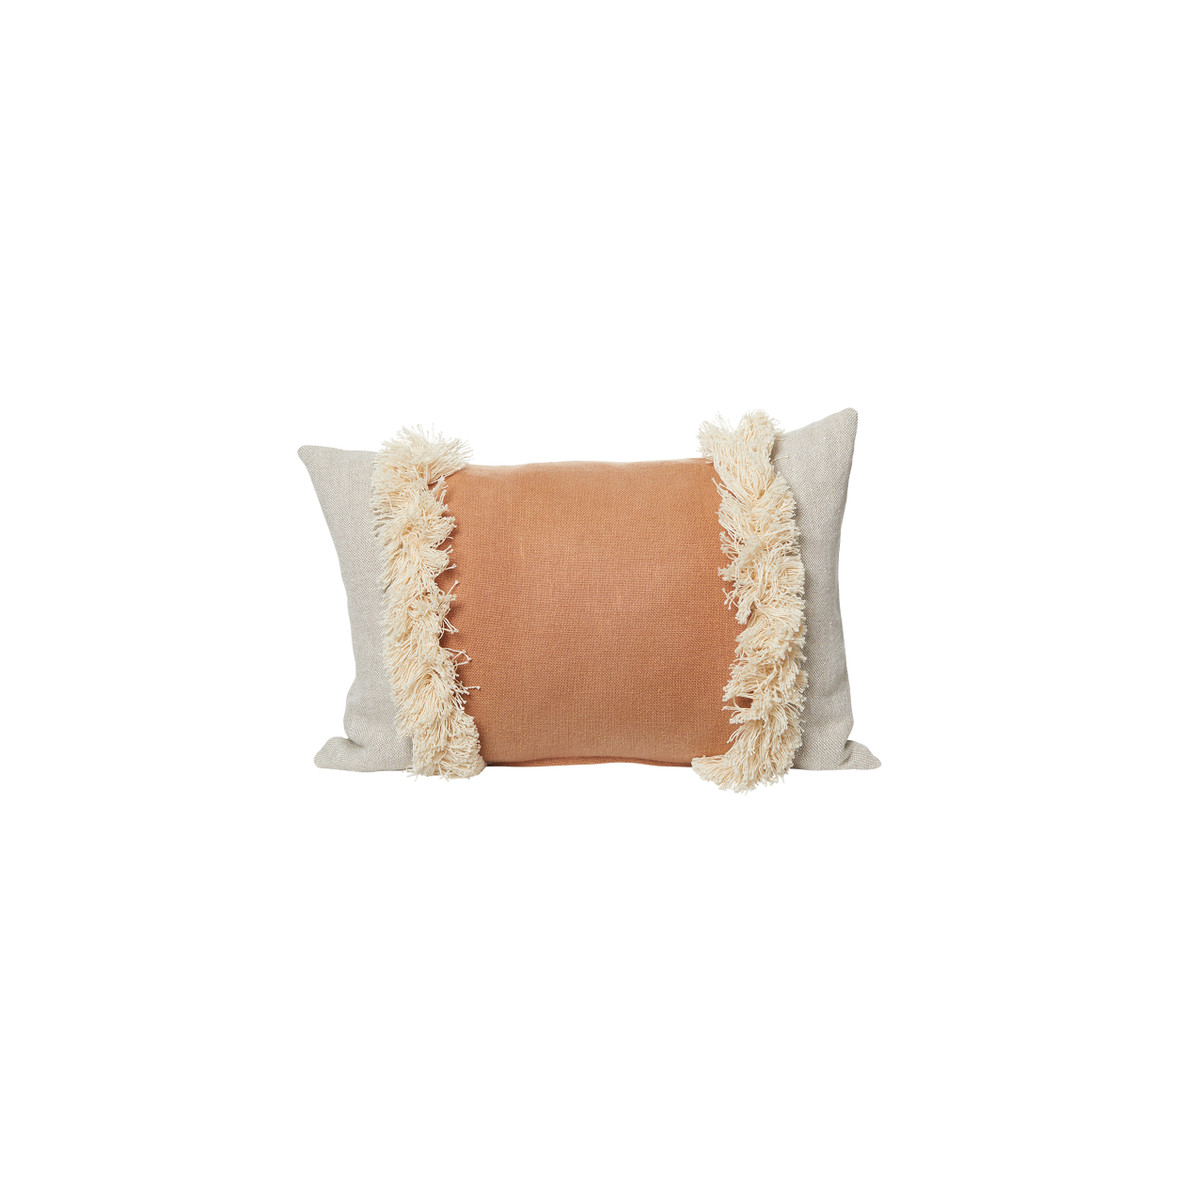 Muse Linen Lumbar Fringe Pillow Sunstone 14 x 20 - Front